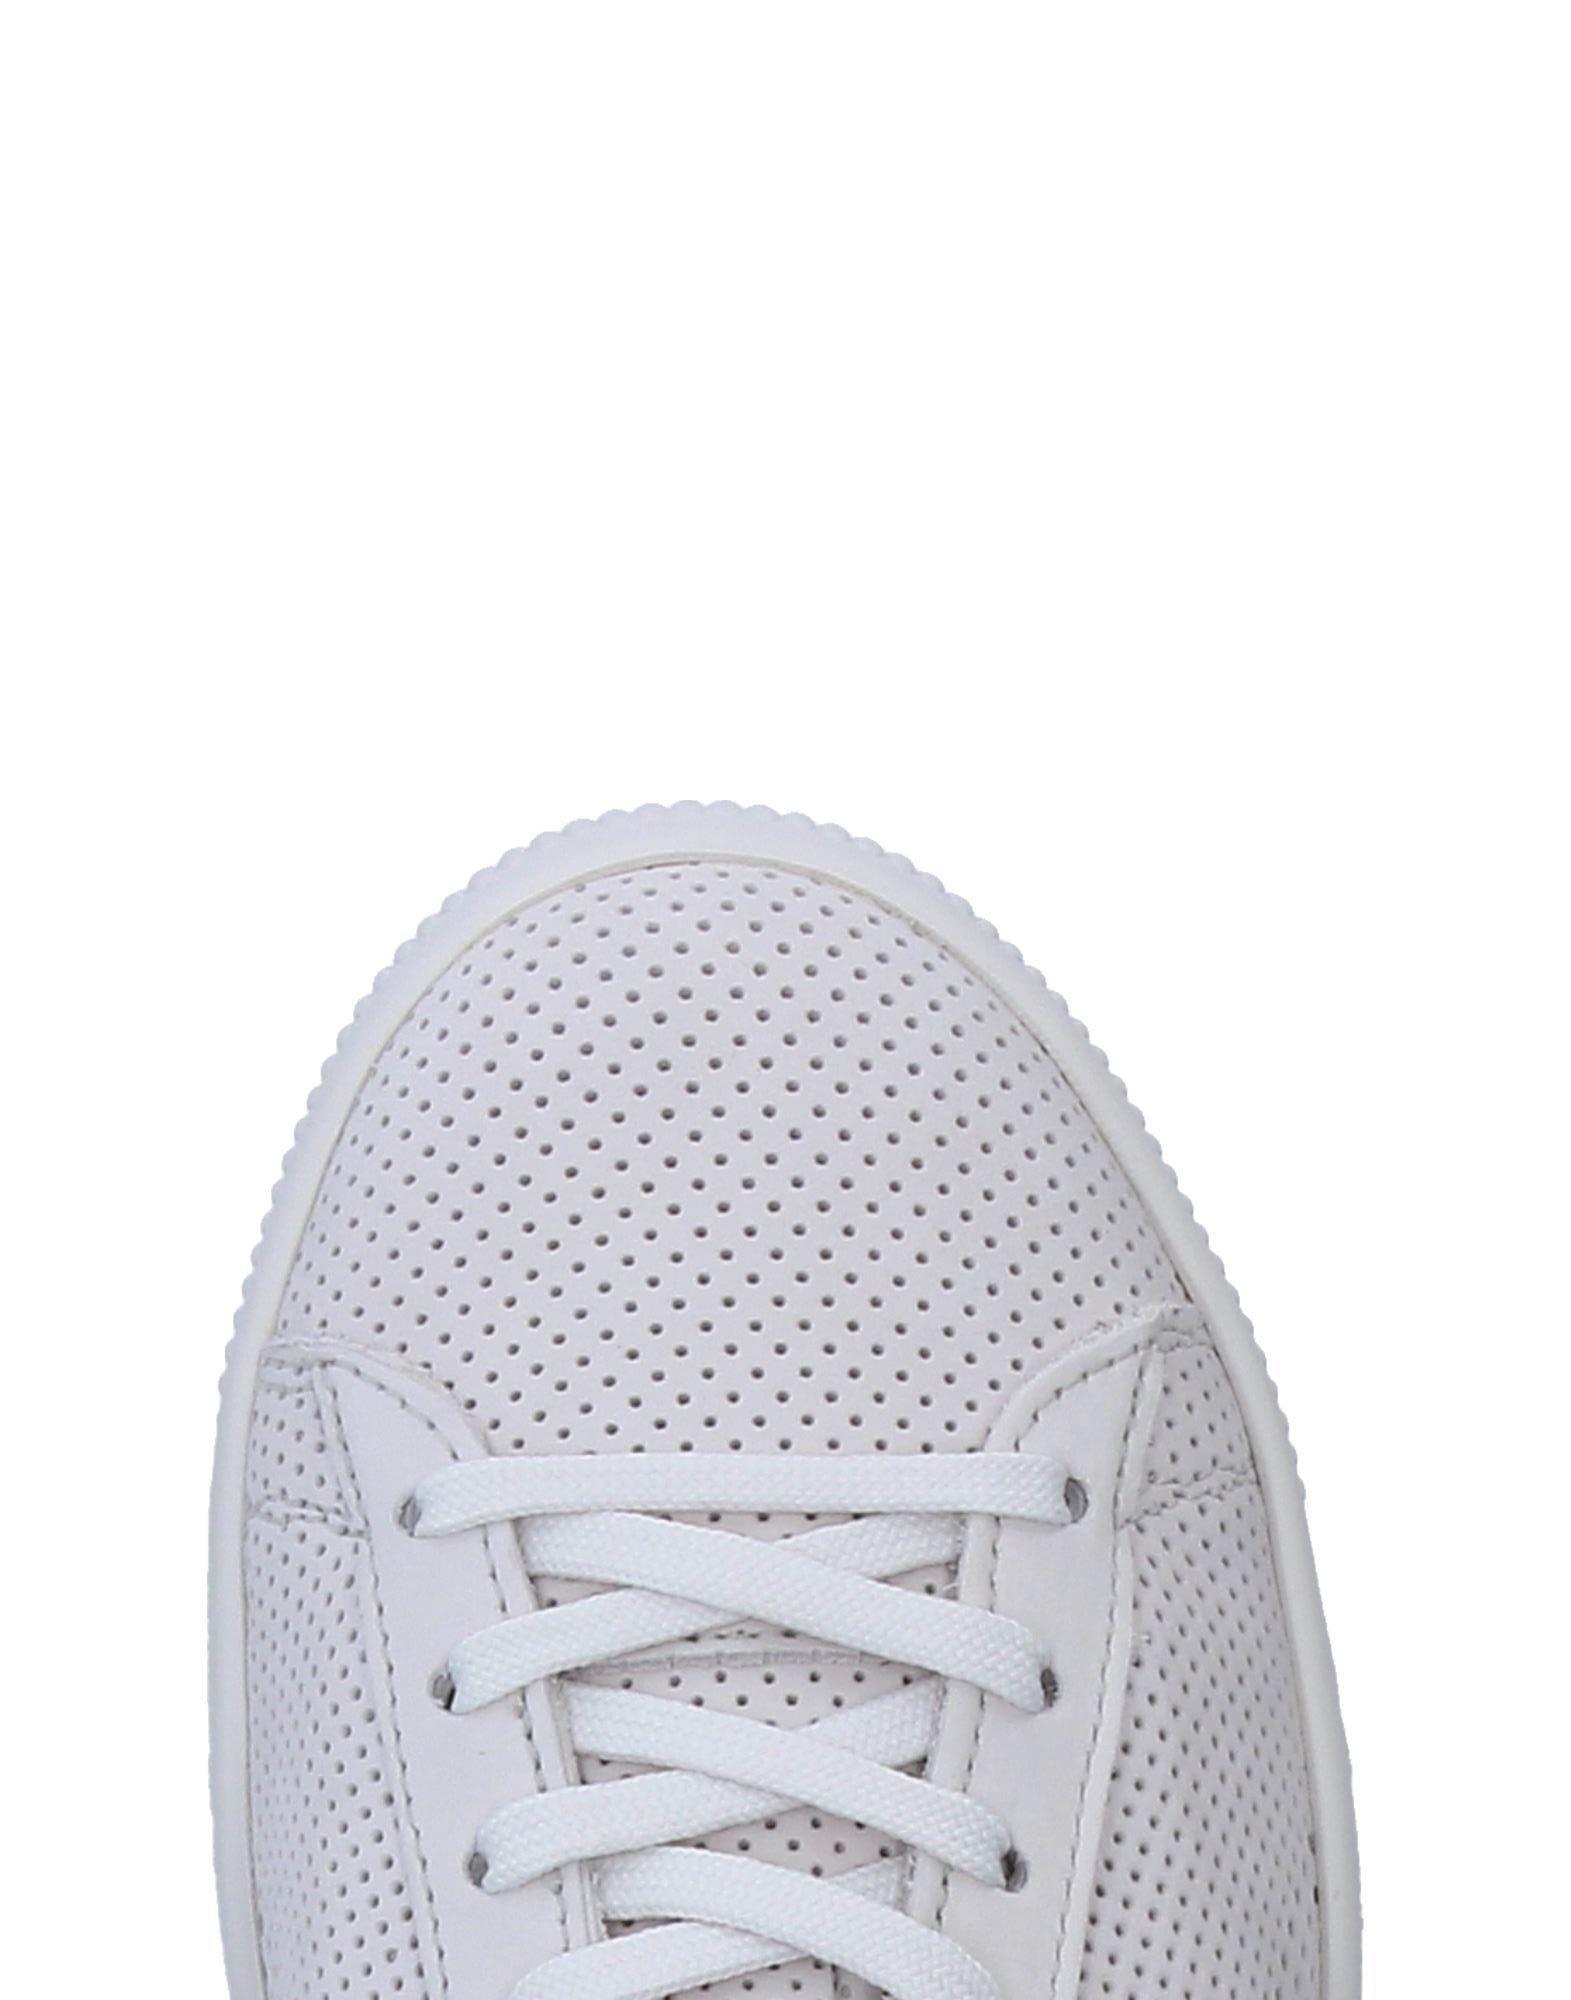 Sneakers Stampd X Puma Femme - Sneakers Stampd X Puma sur